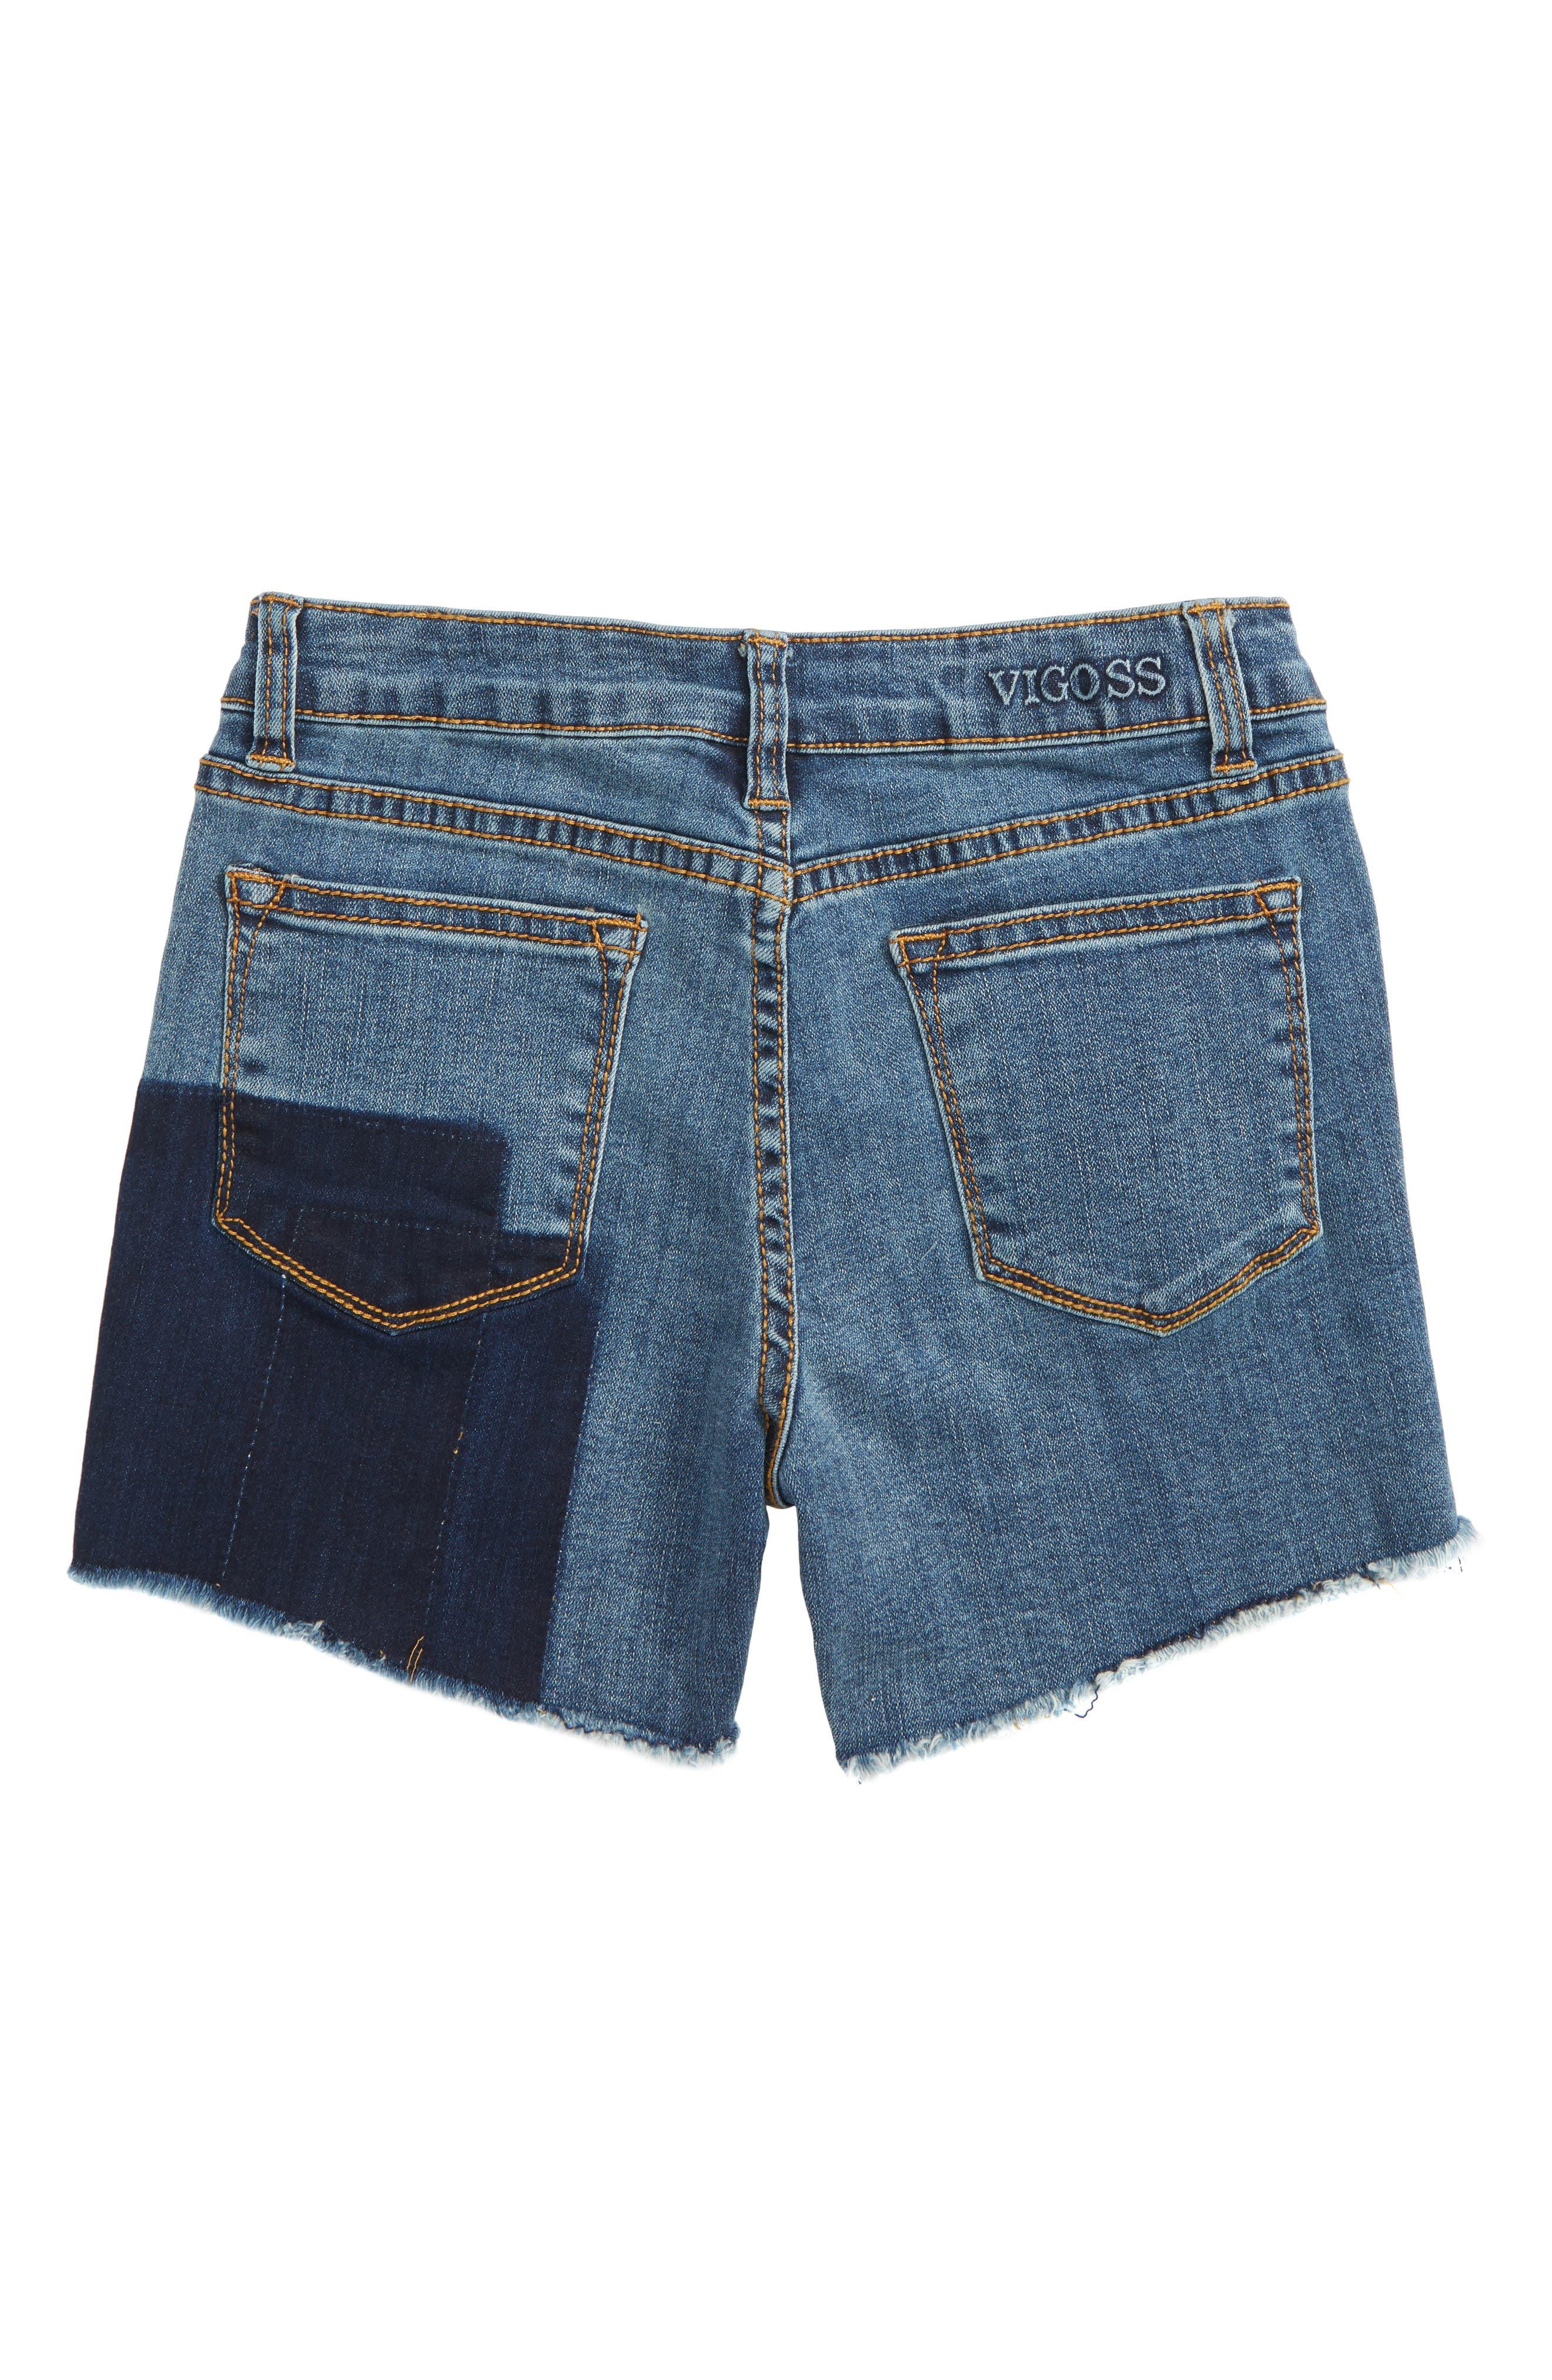 Shadow Frayed Cutoff Denim Shorts,                             Alternate thumbnail 2, color,                             426